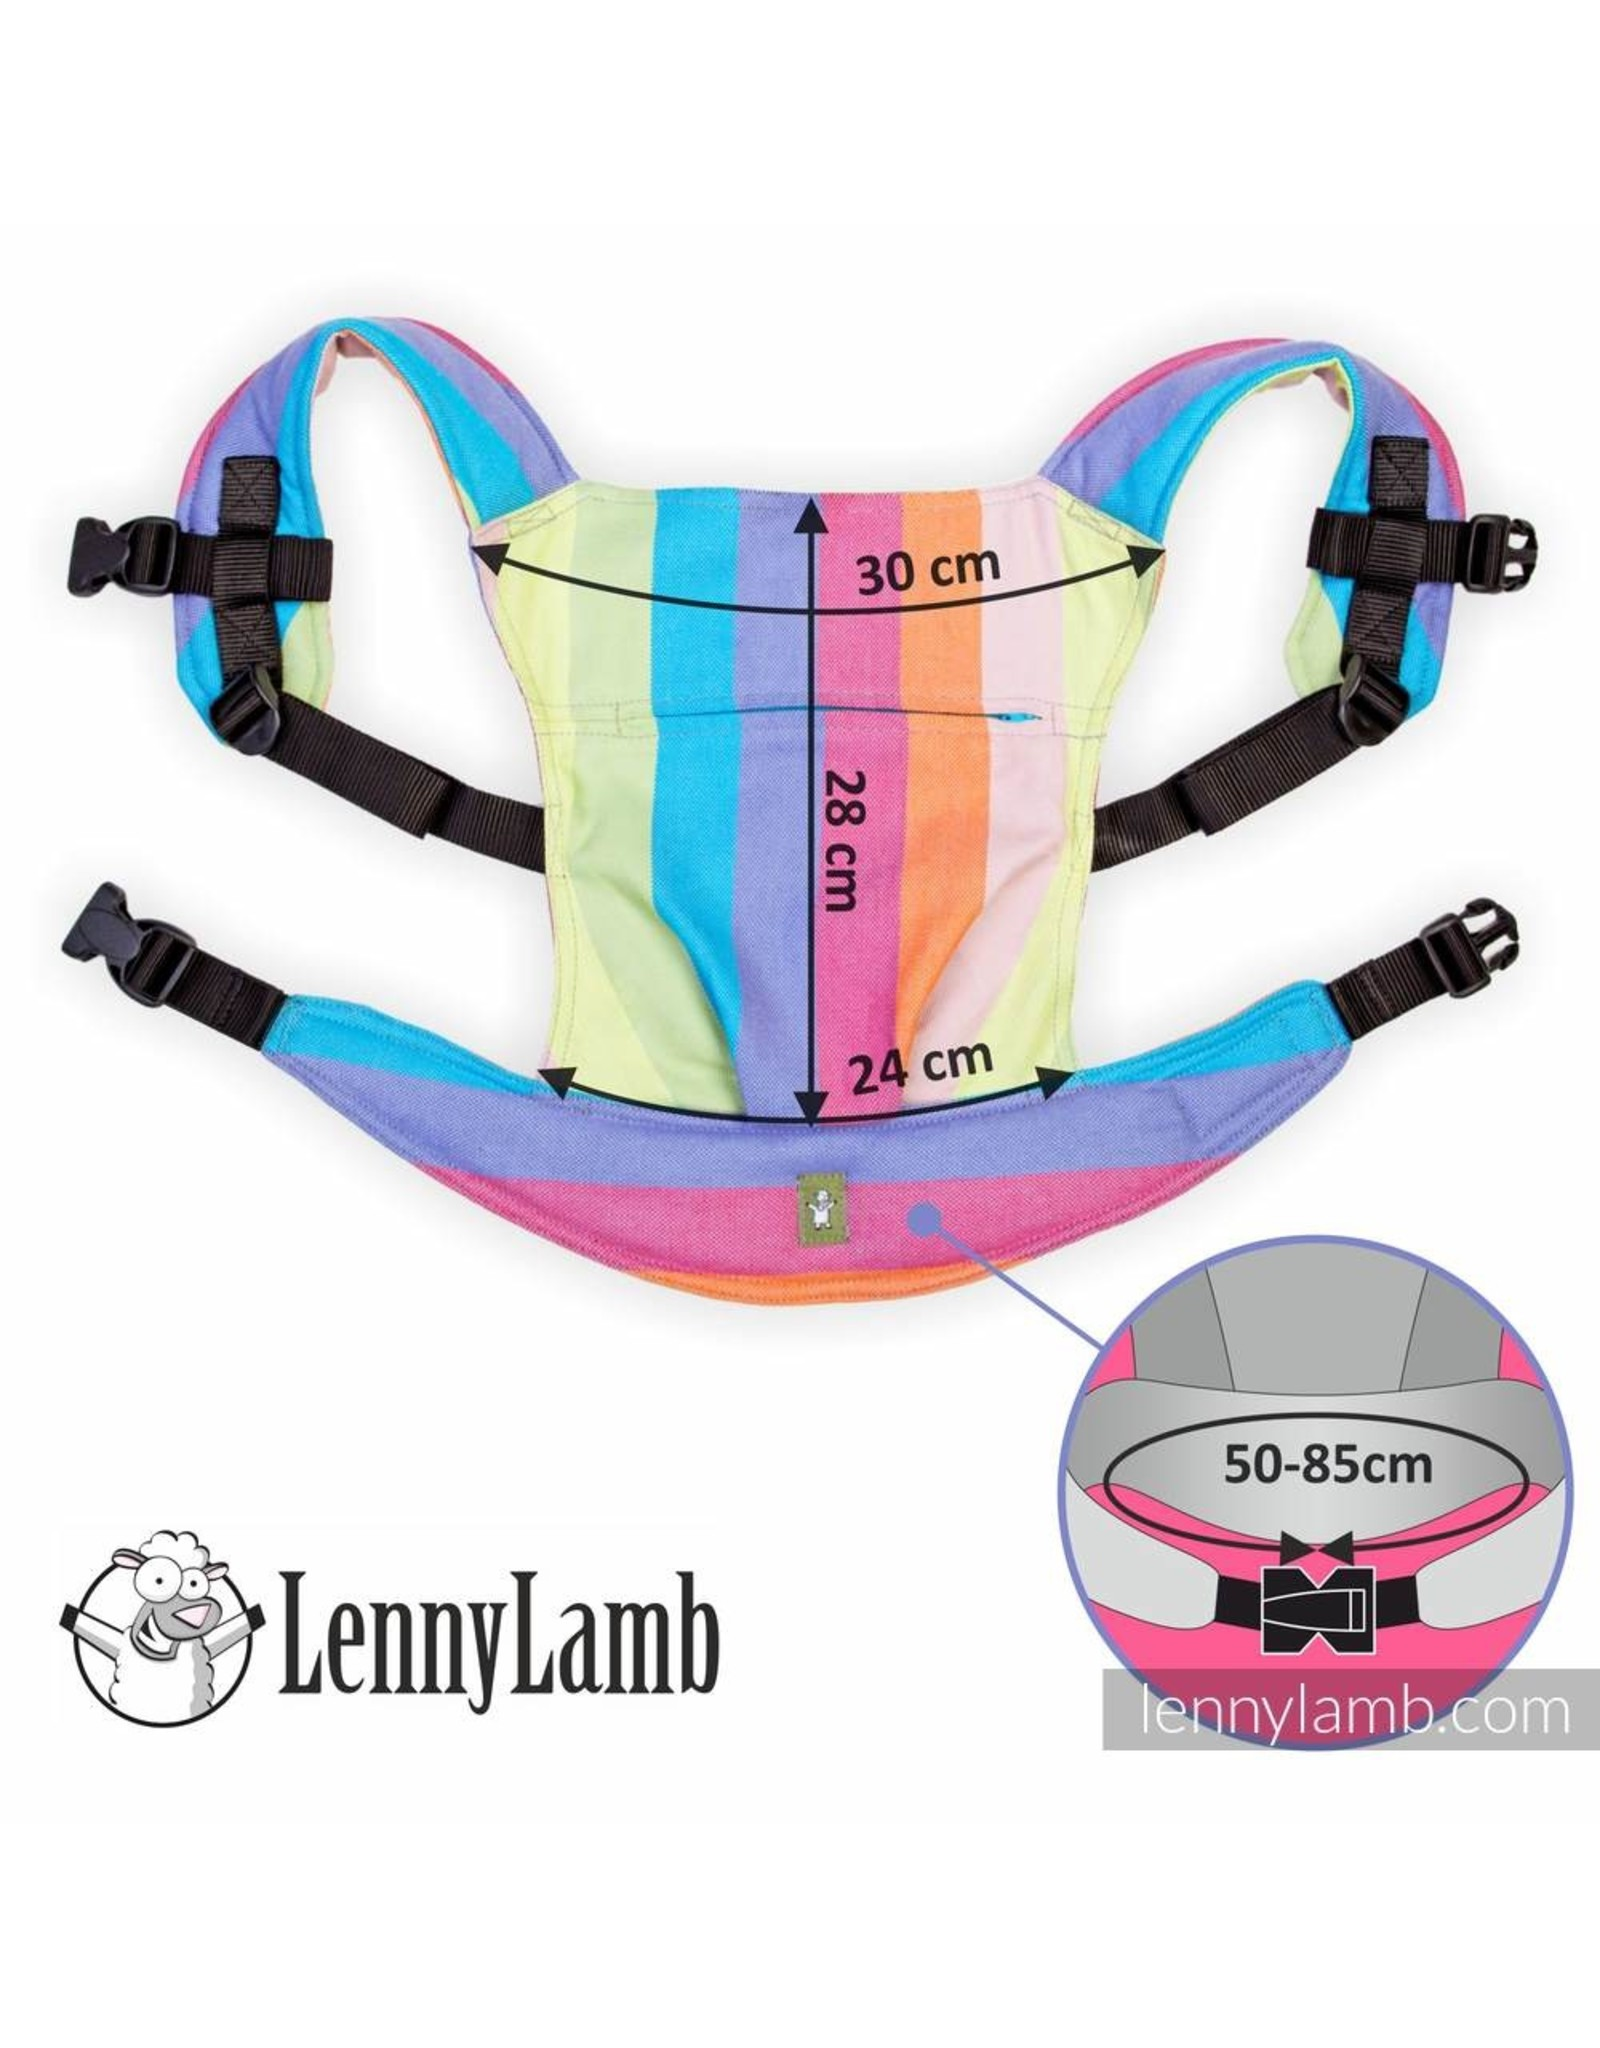 LennyLamb LennyLamb Poppendrager Swallows Rainbow Dark